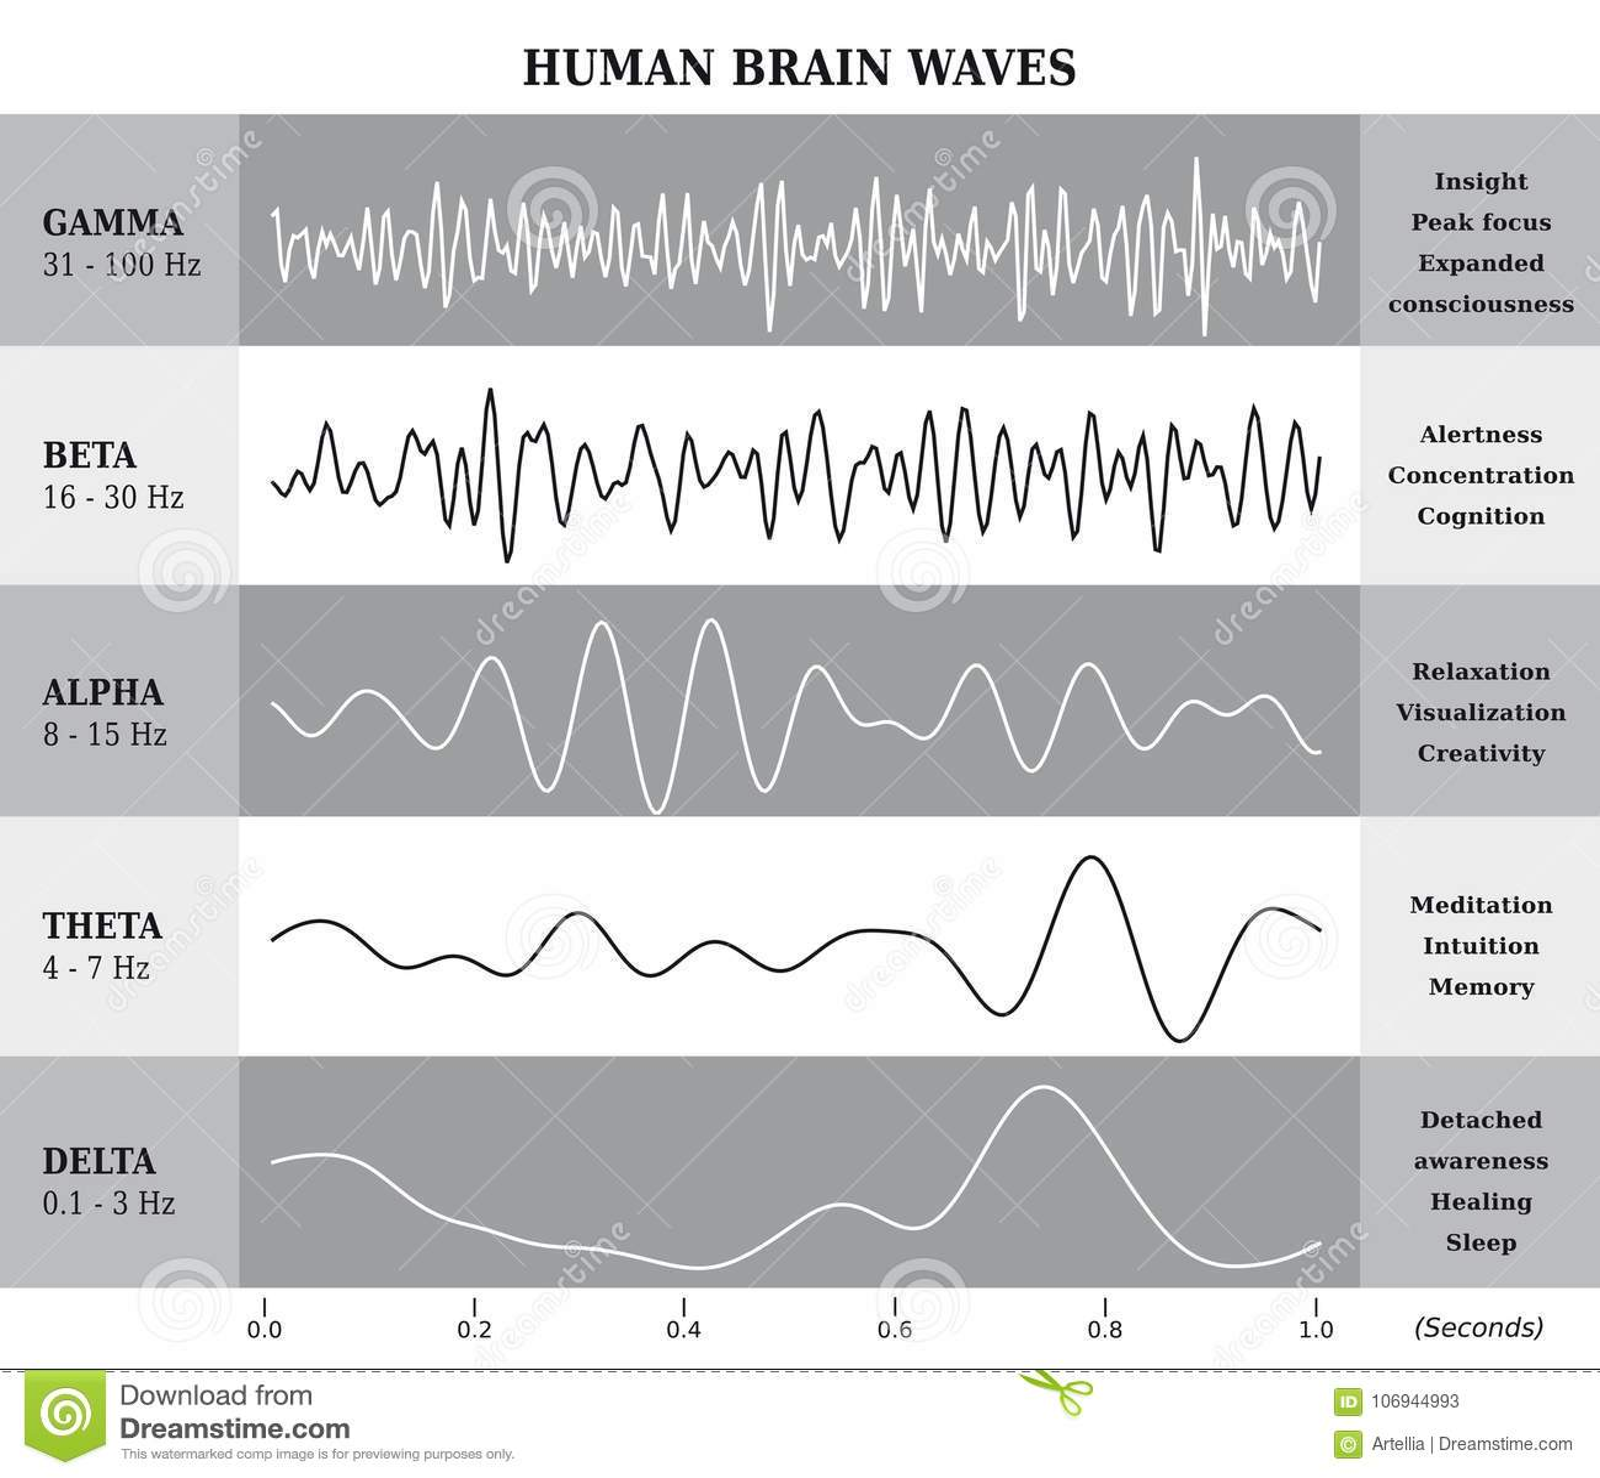 Human Brain Waves Diagram / Chart / Illustration